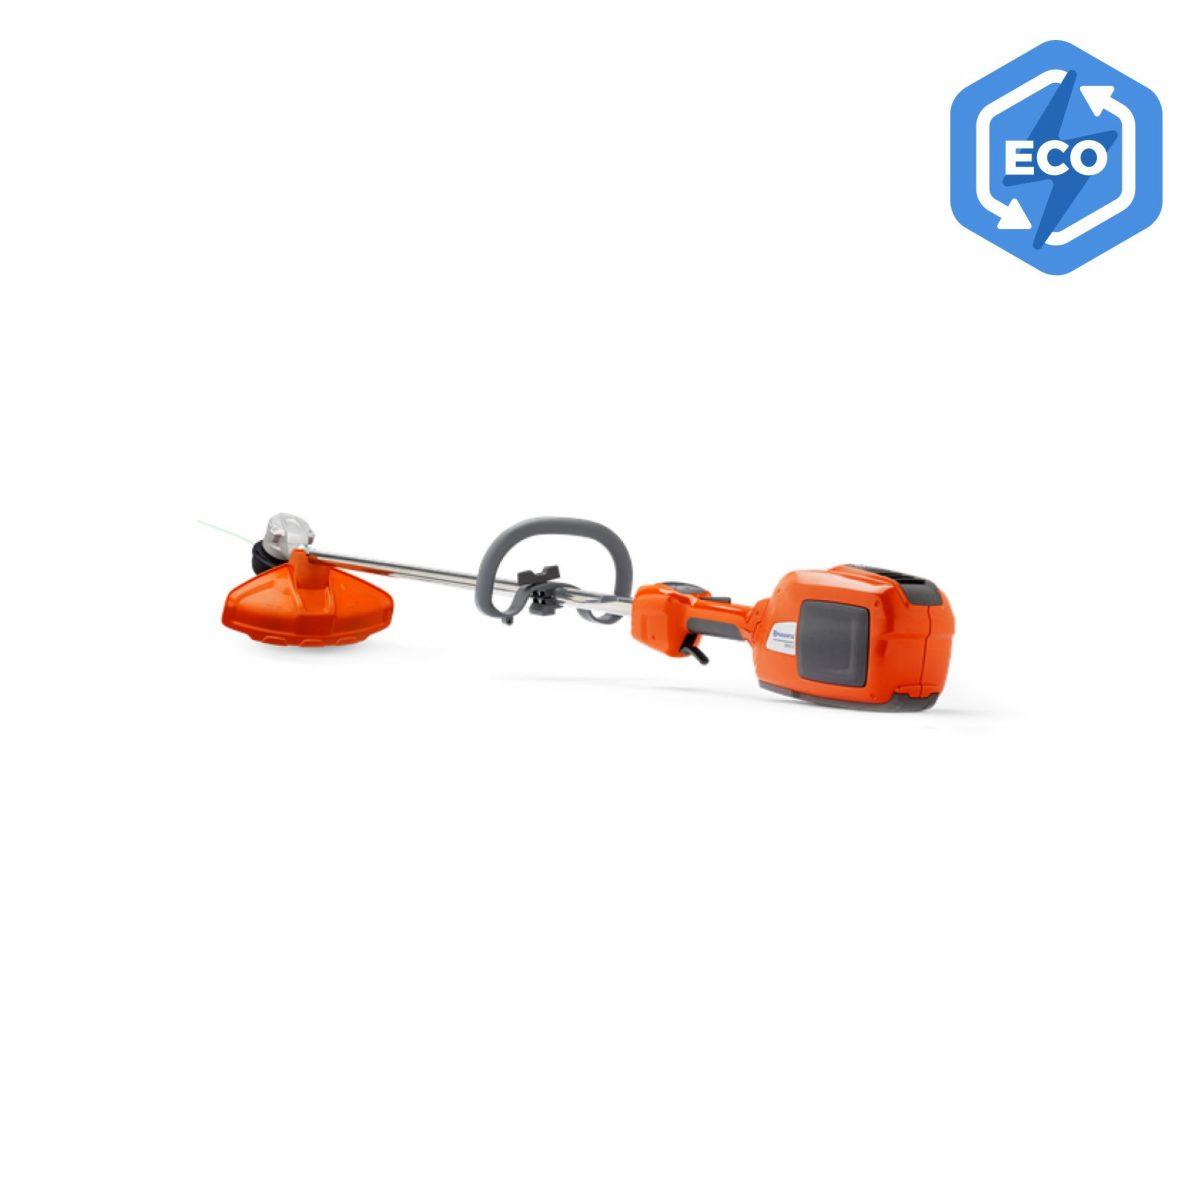 Husqvarna 520iLX Brushcutter